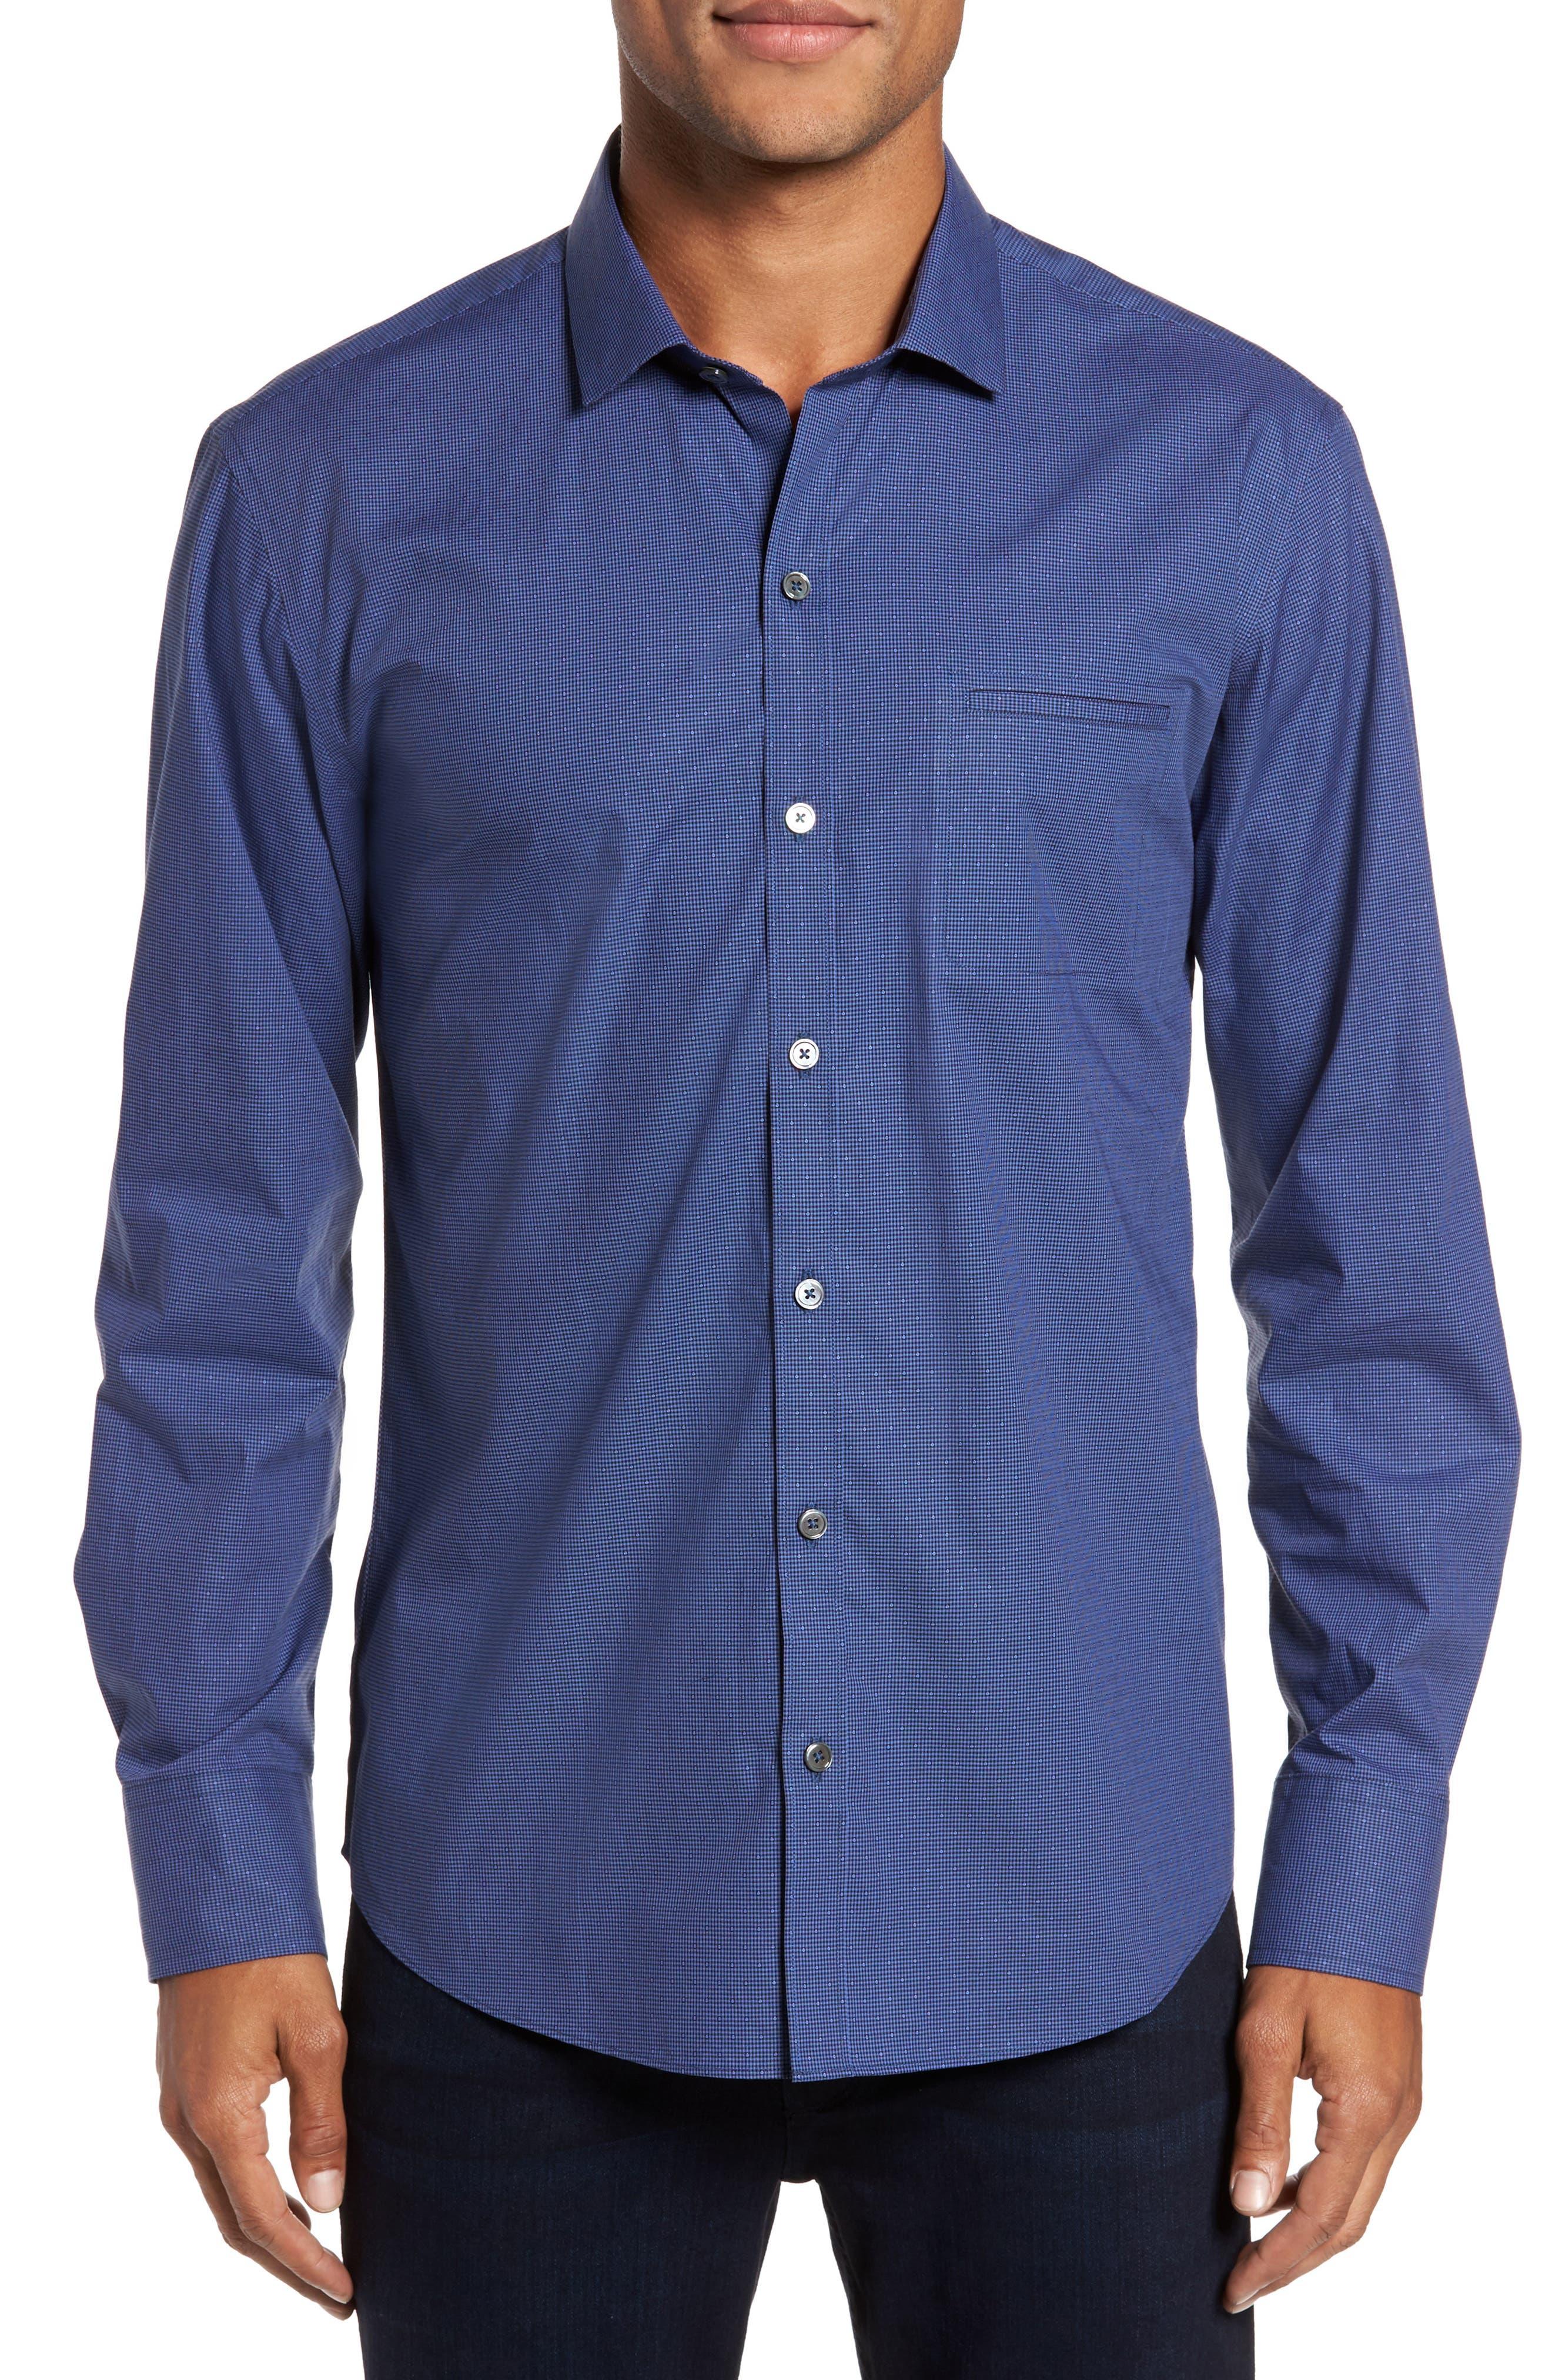 Alternate Image 1 Selected - Zachary Prell Galileo Dobby Microcheck Sport Shirt